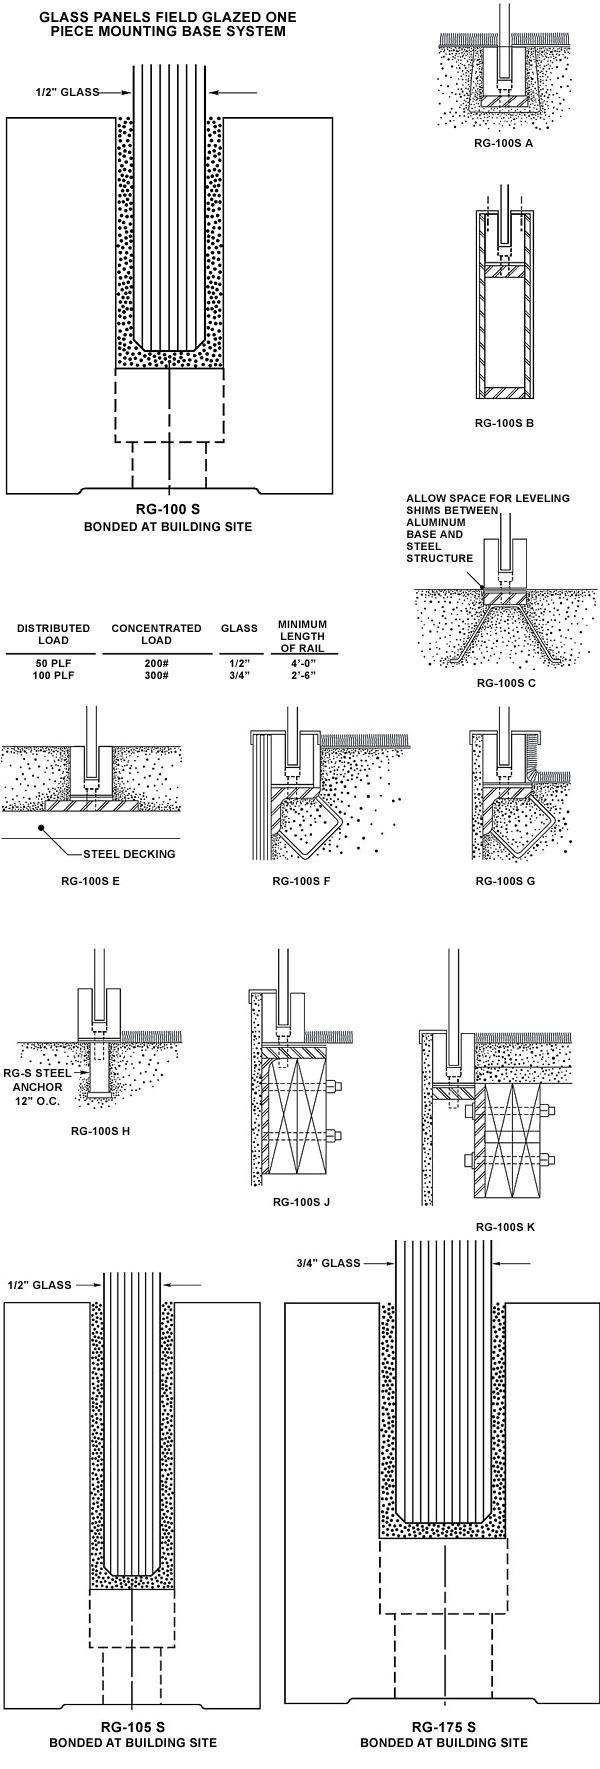 Railglass One Piece Mounting Base System